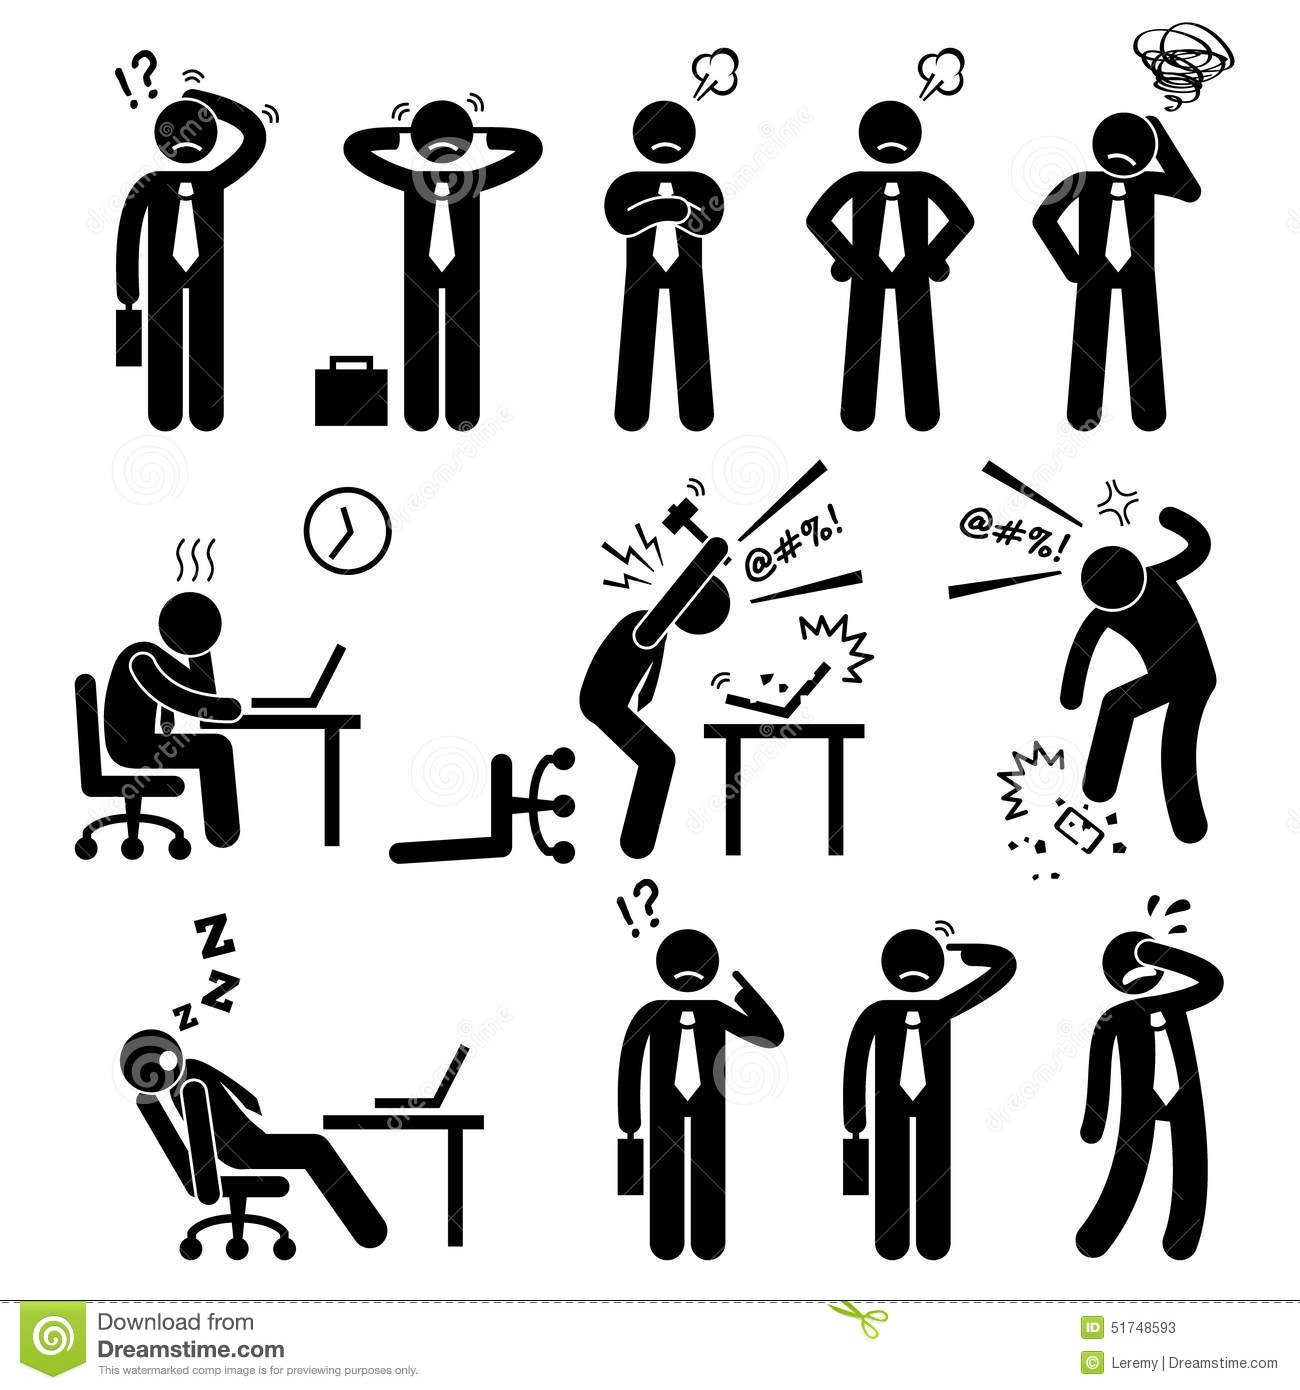 free download Stress business man pressure. Businessman clipart stressed.